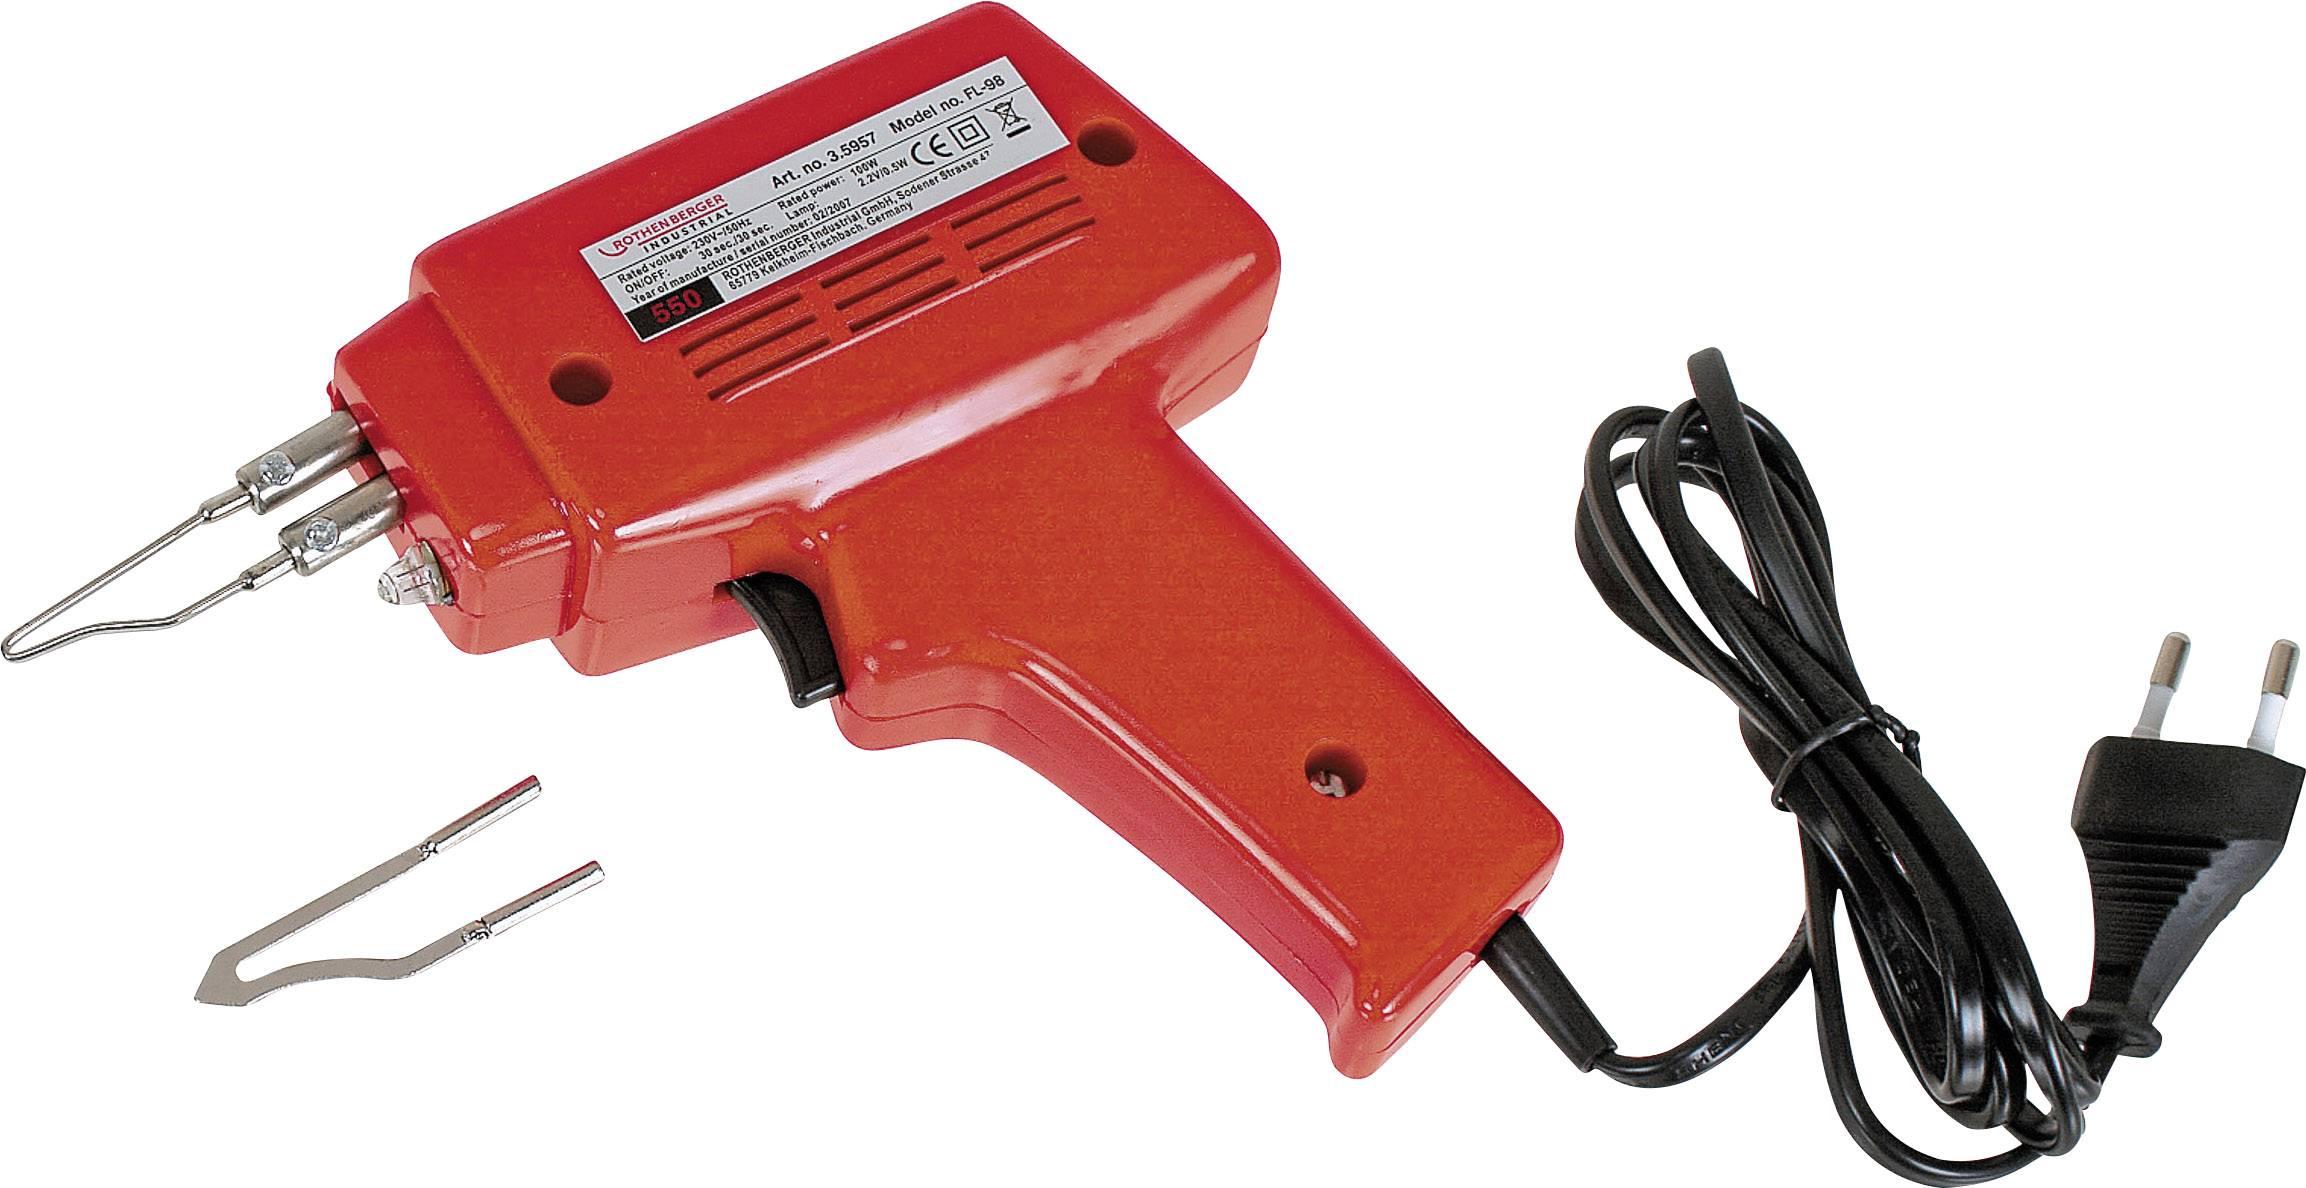 Transformátorová spájkovačka Rothenberger Industrial RoQuick 35957, 230 V, 100 W